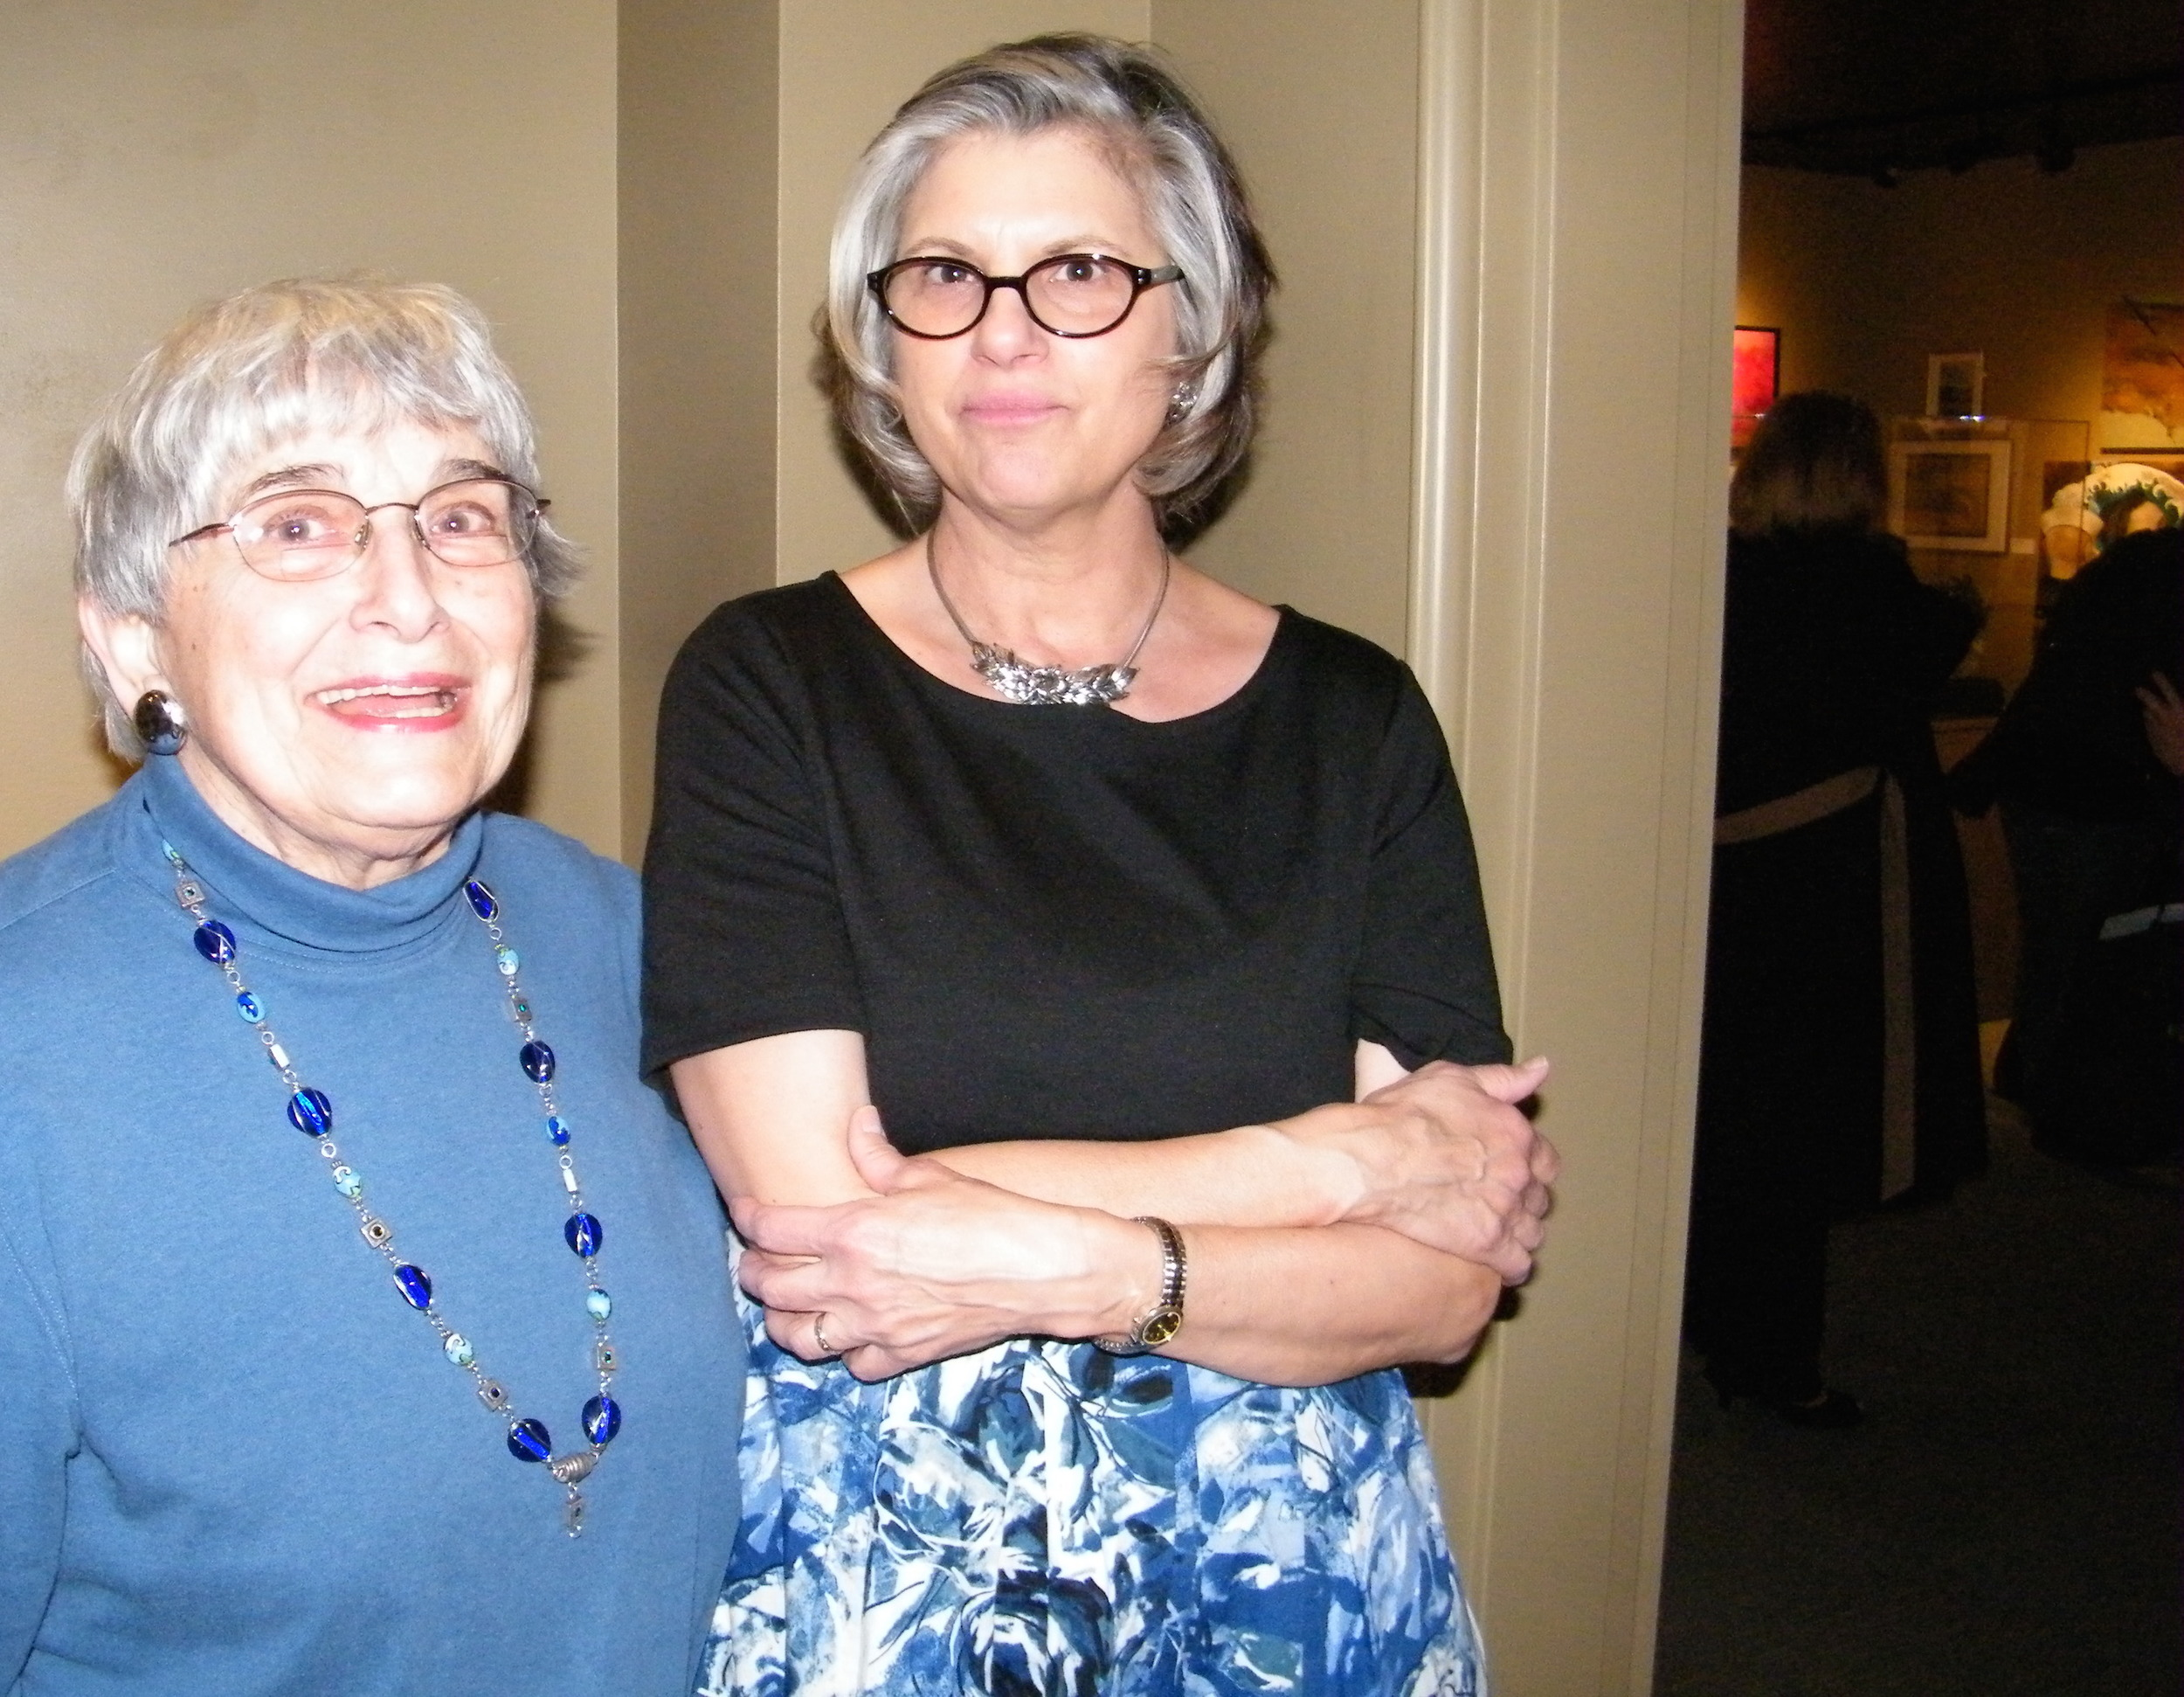 Julie Sabit and Jackie Rybinski, Exhibition Co-Chairs